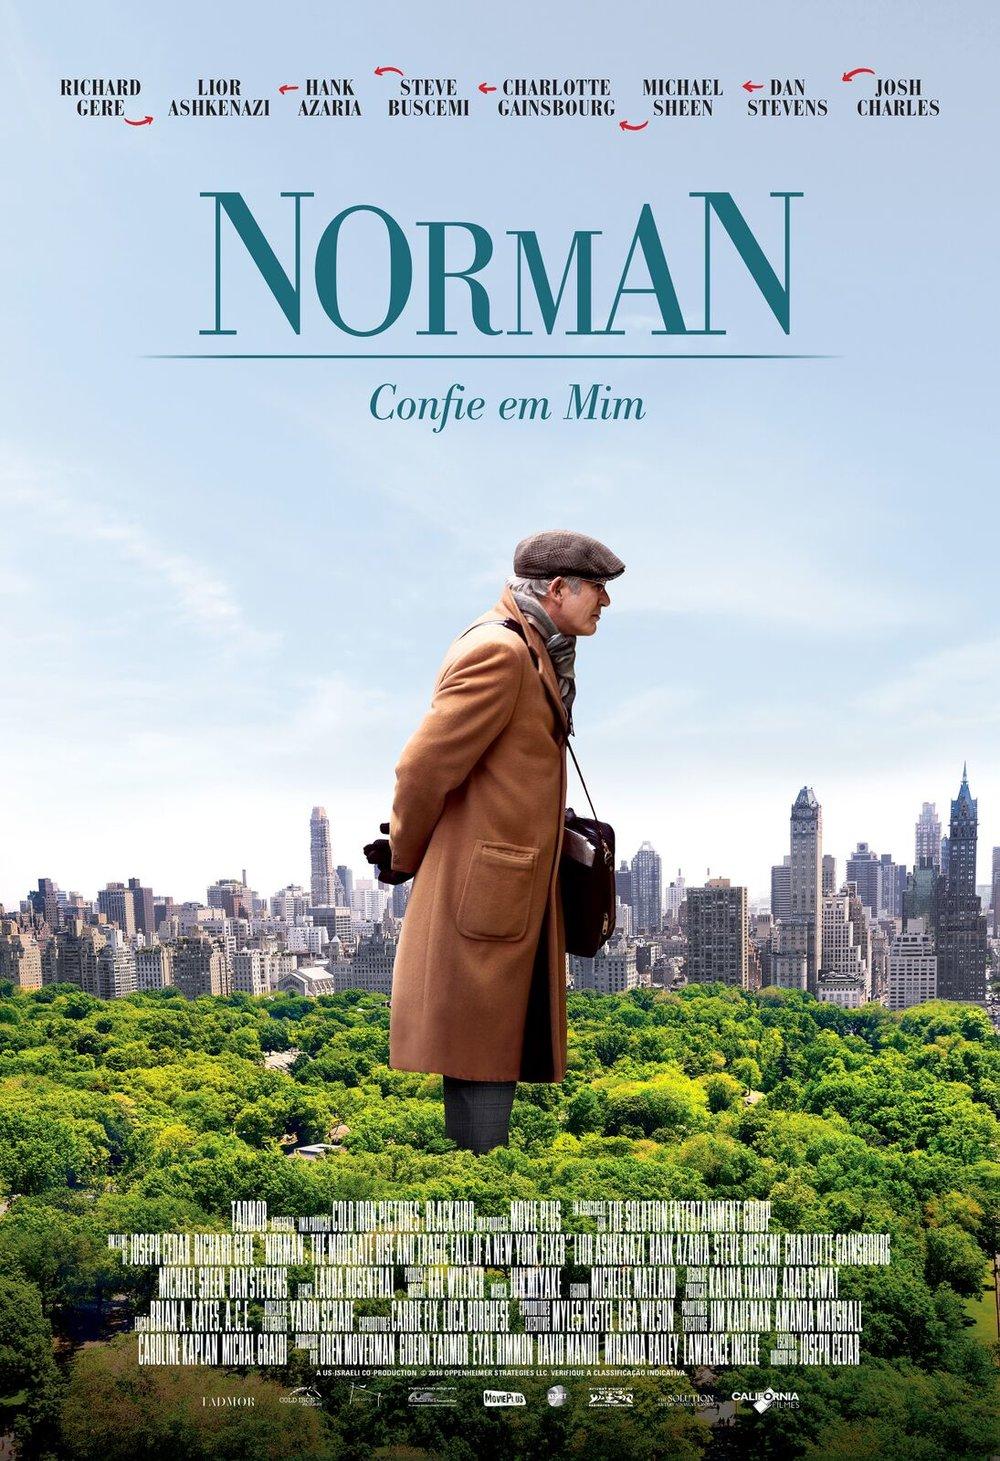 Norman - Confie em Mim.jpeg